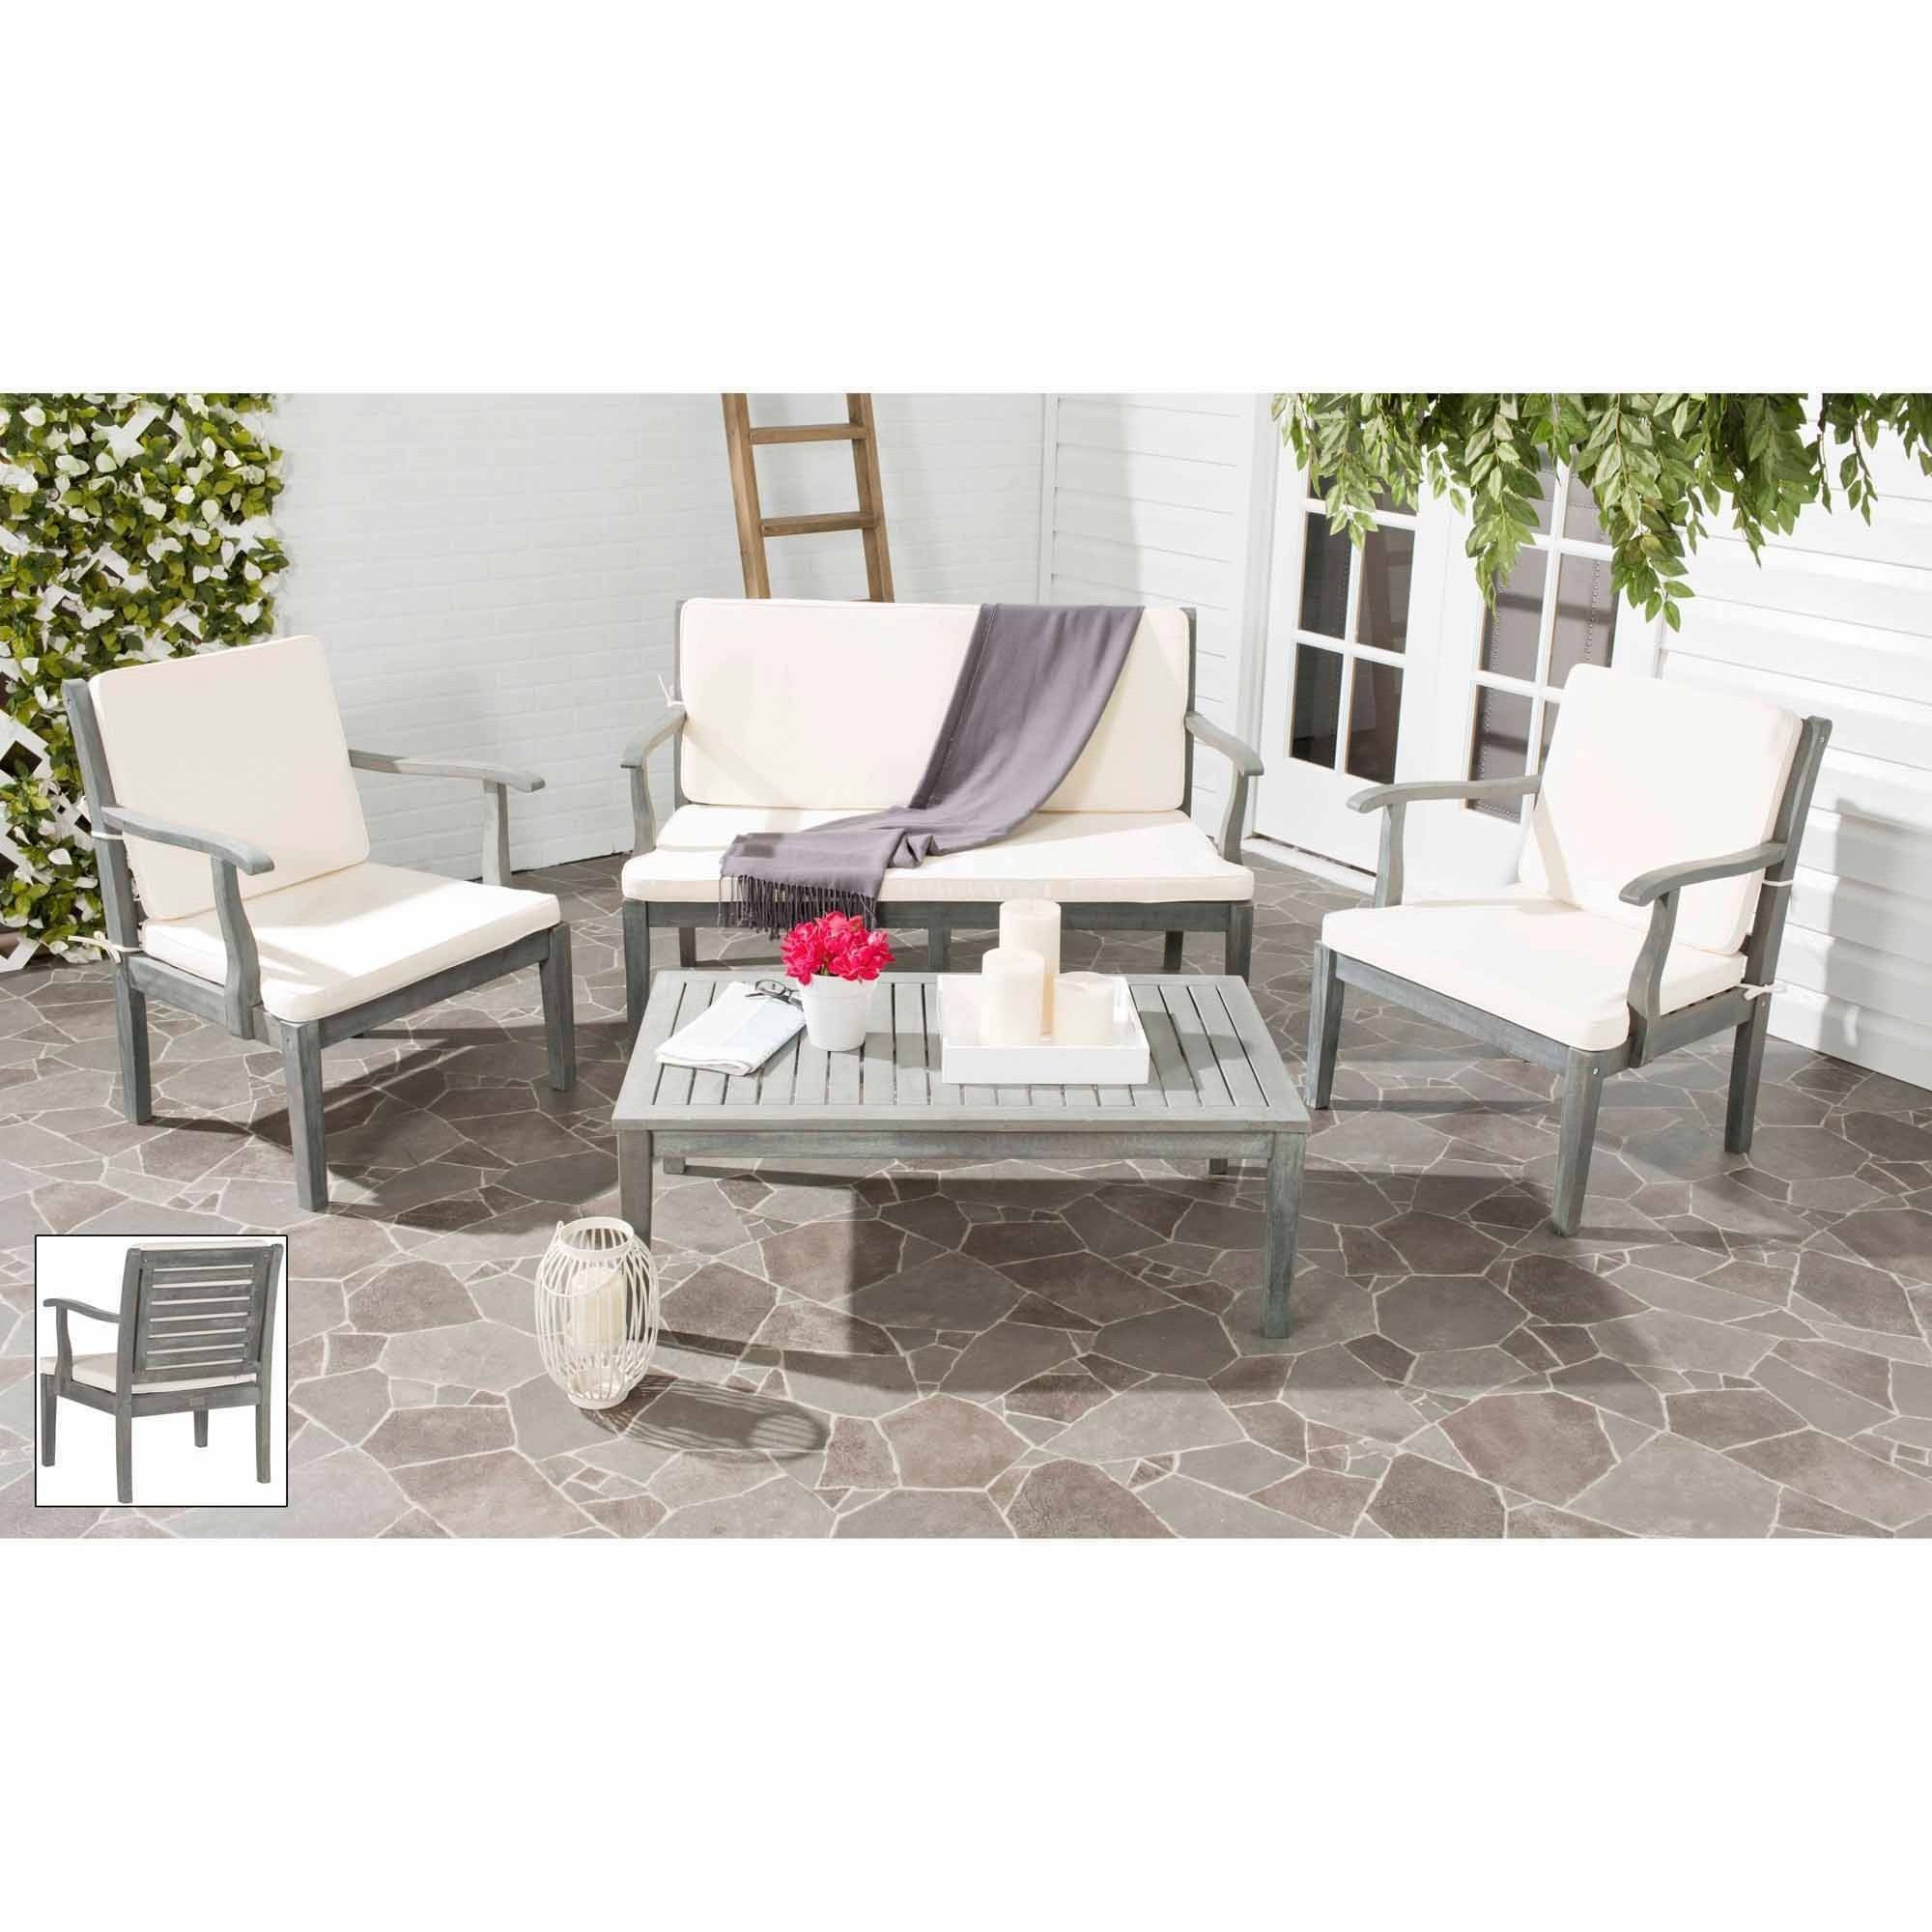 Safavieh Fresno 4-Piece Outdoor Living Set, Multiple Colors